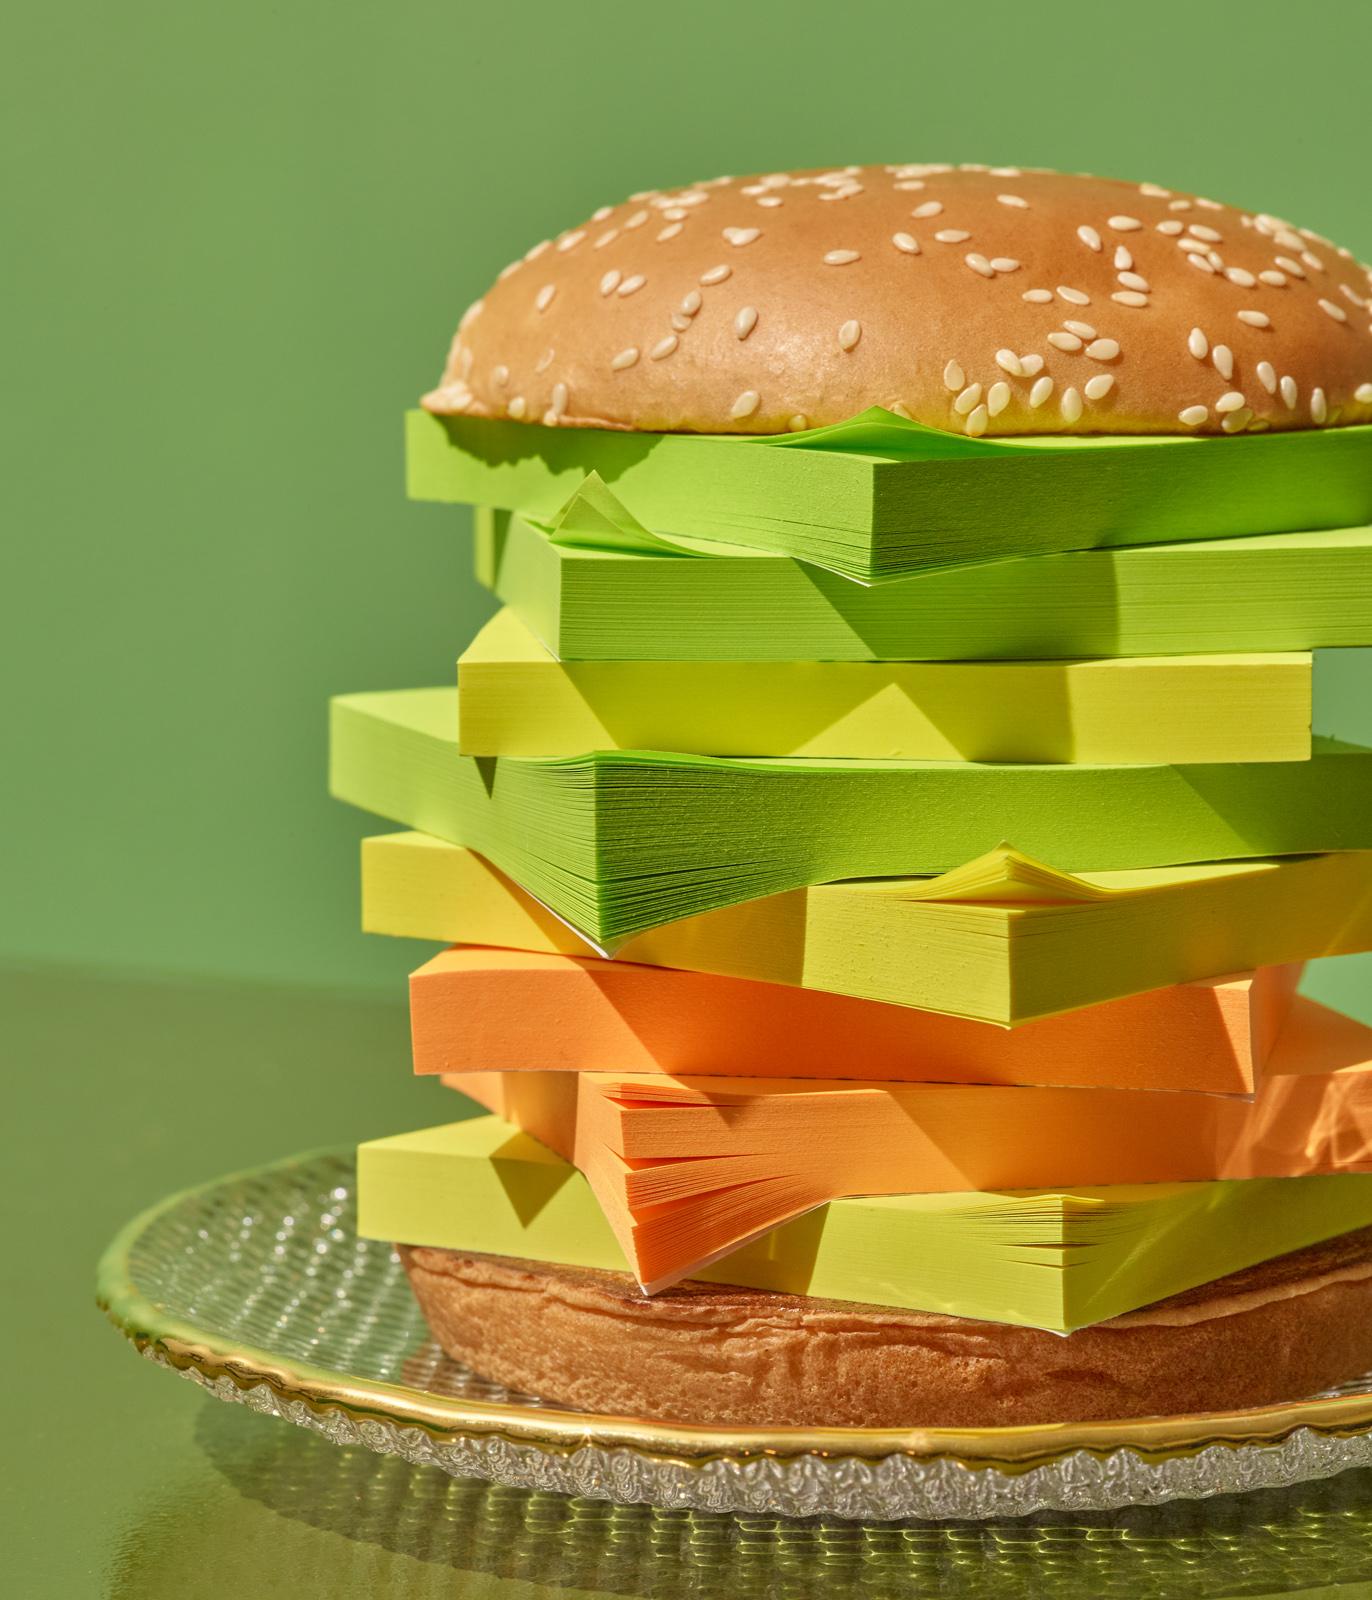 CaptureOne_Green_MM_84126_postit-burger-closeup